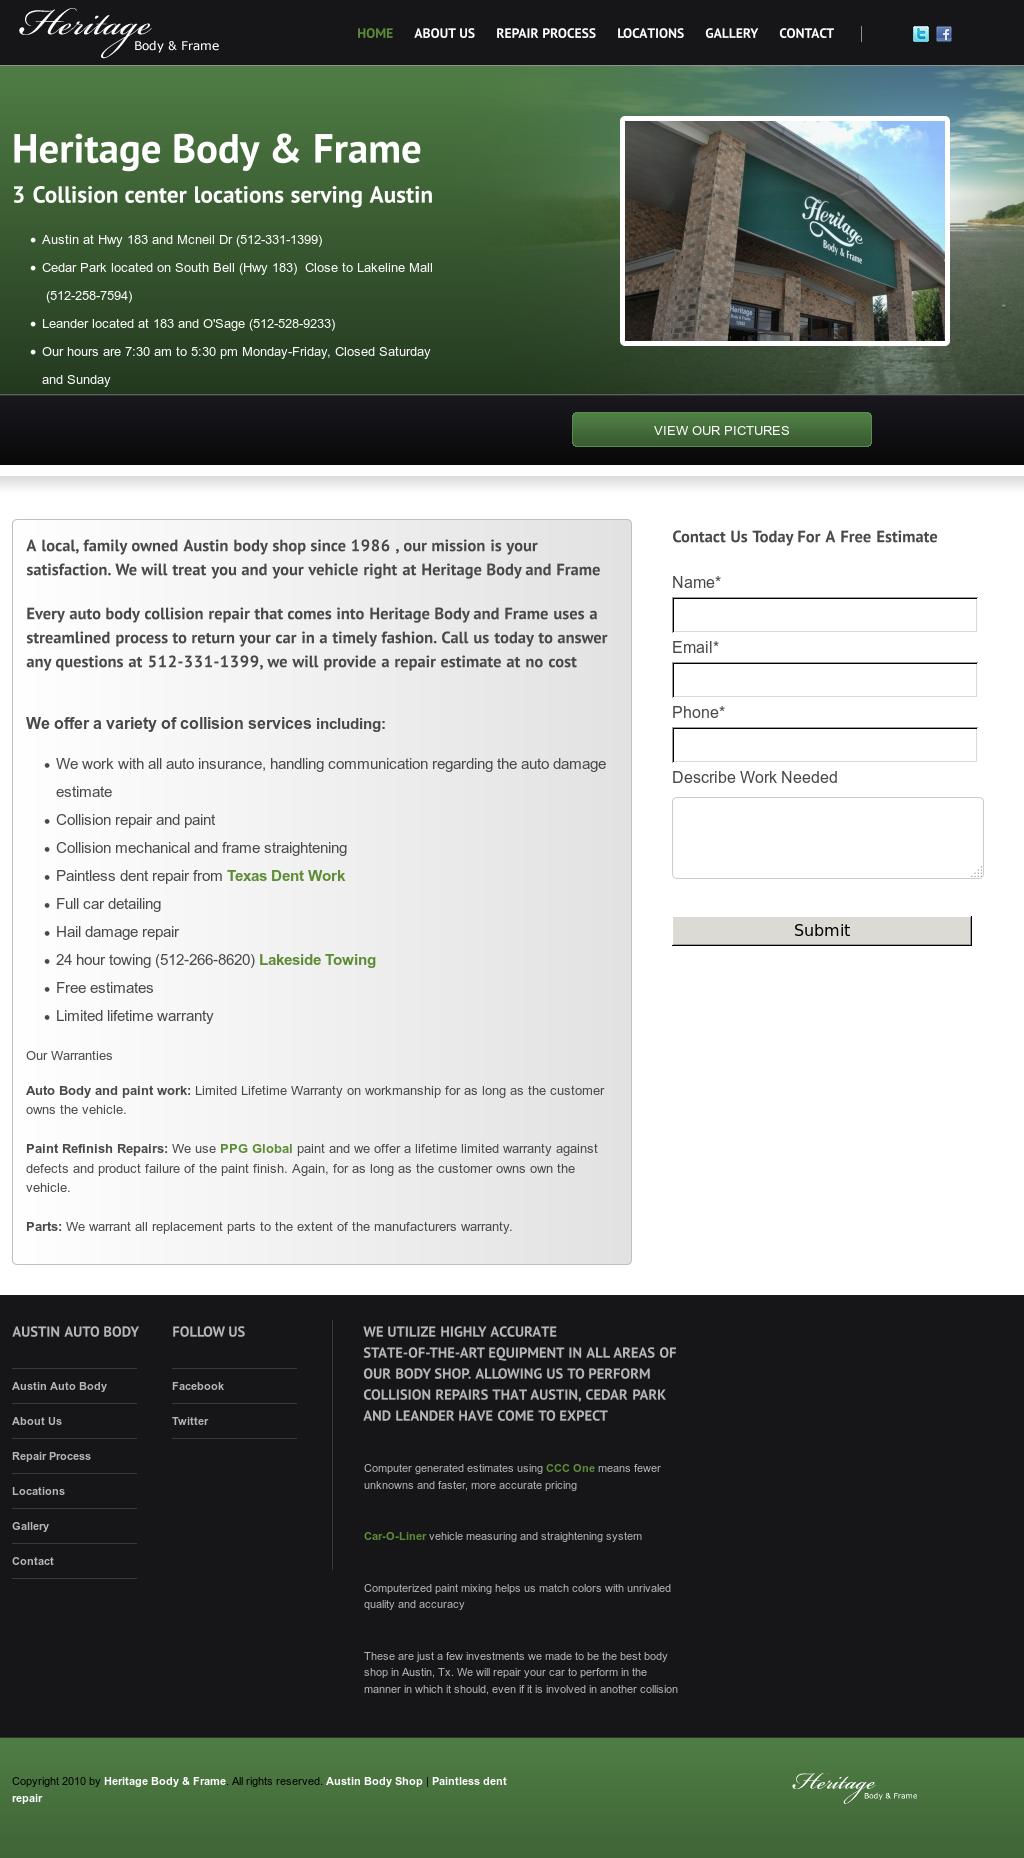 Heritagebodyandframe Competitors, Revenue and Employees - Owler ...